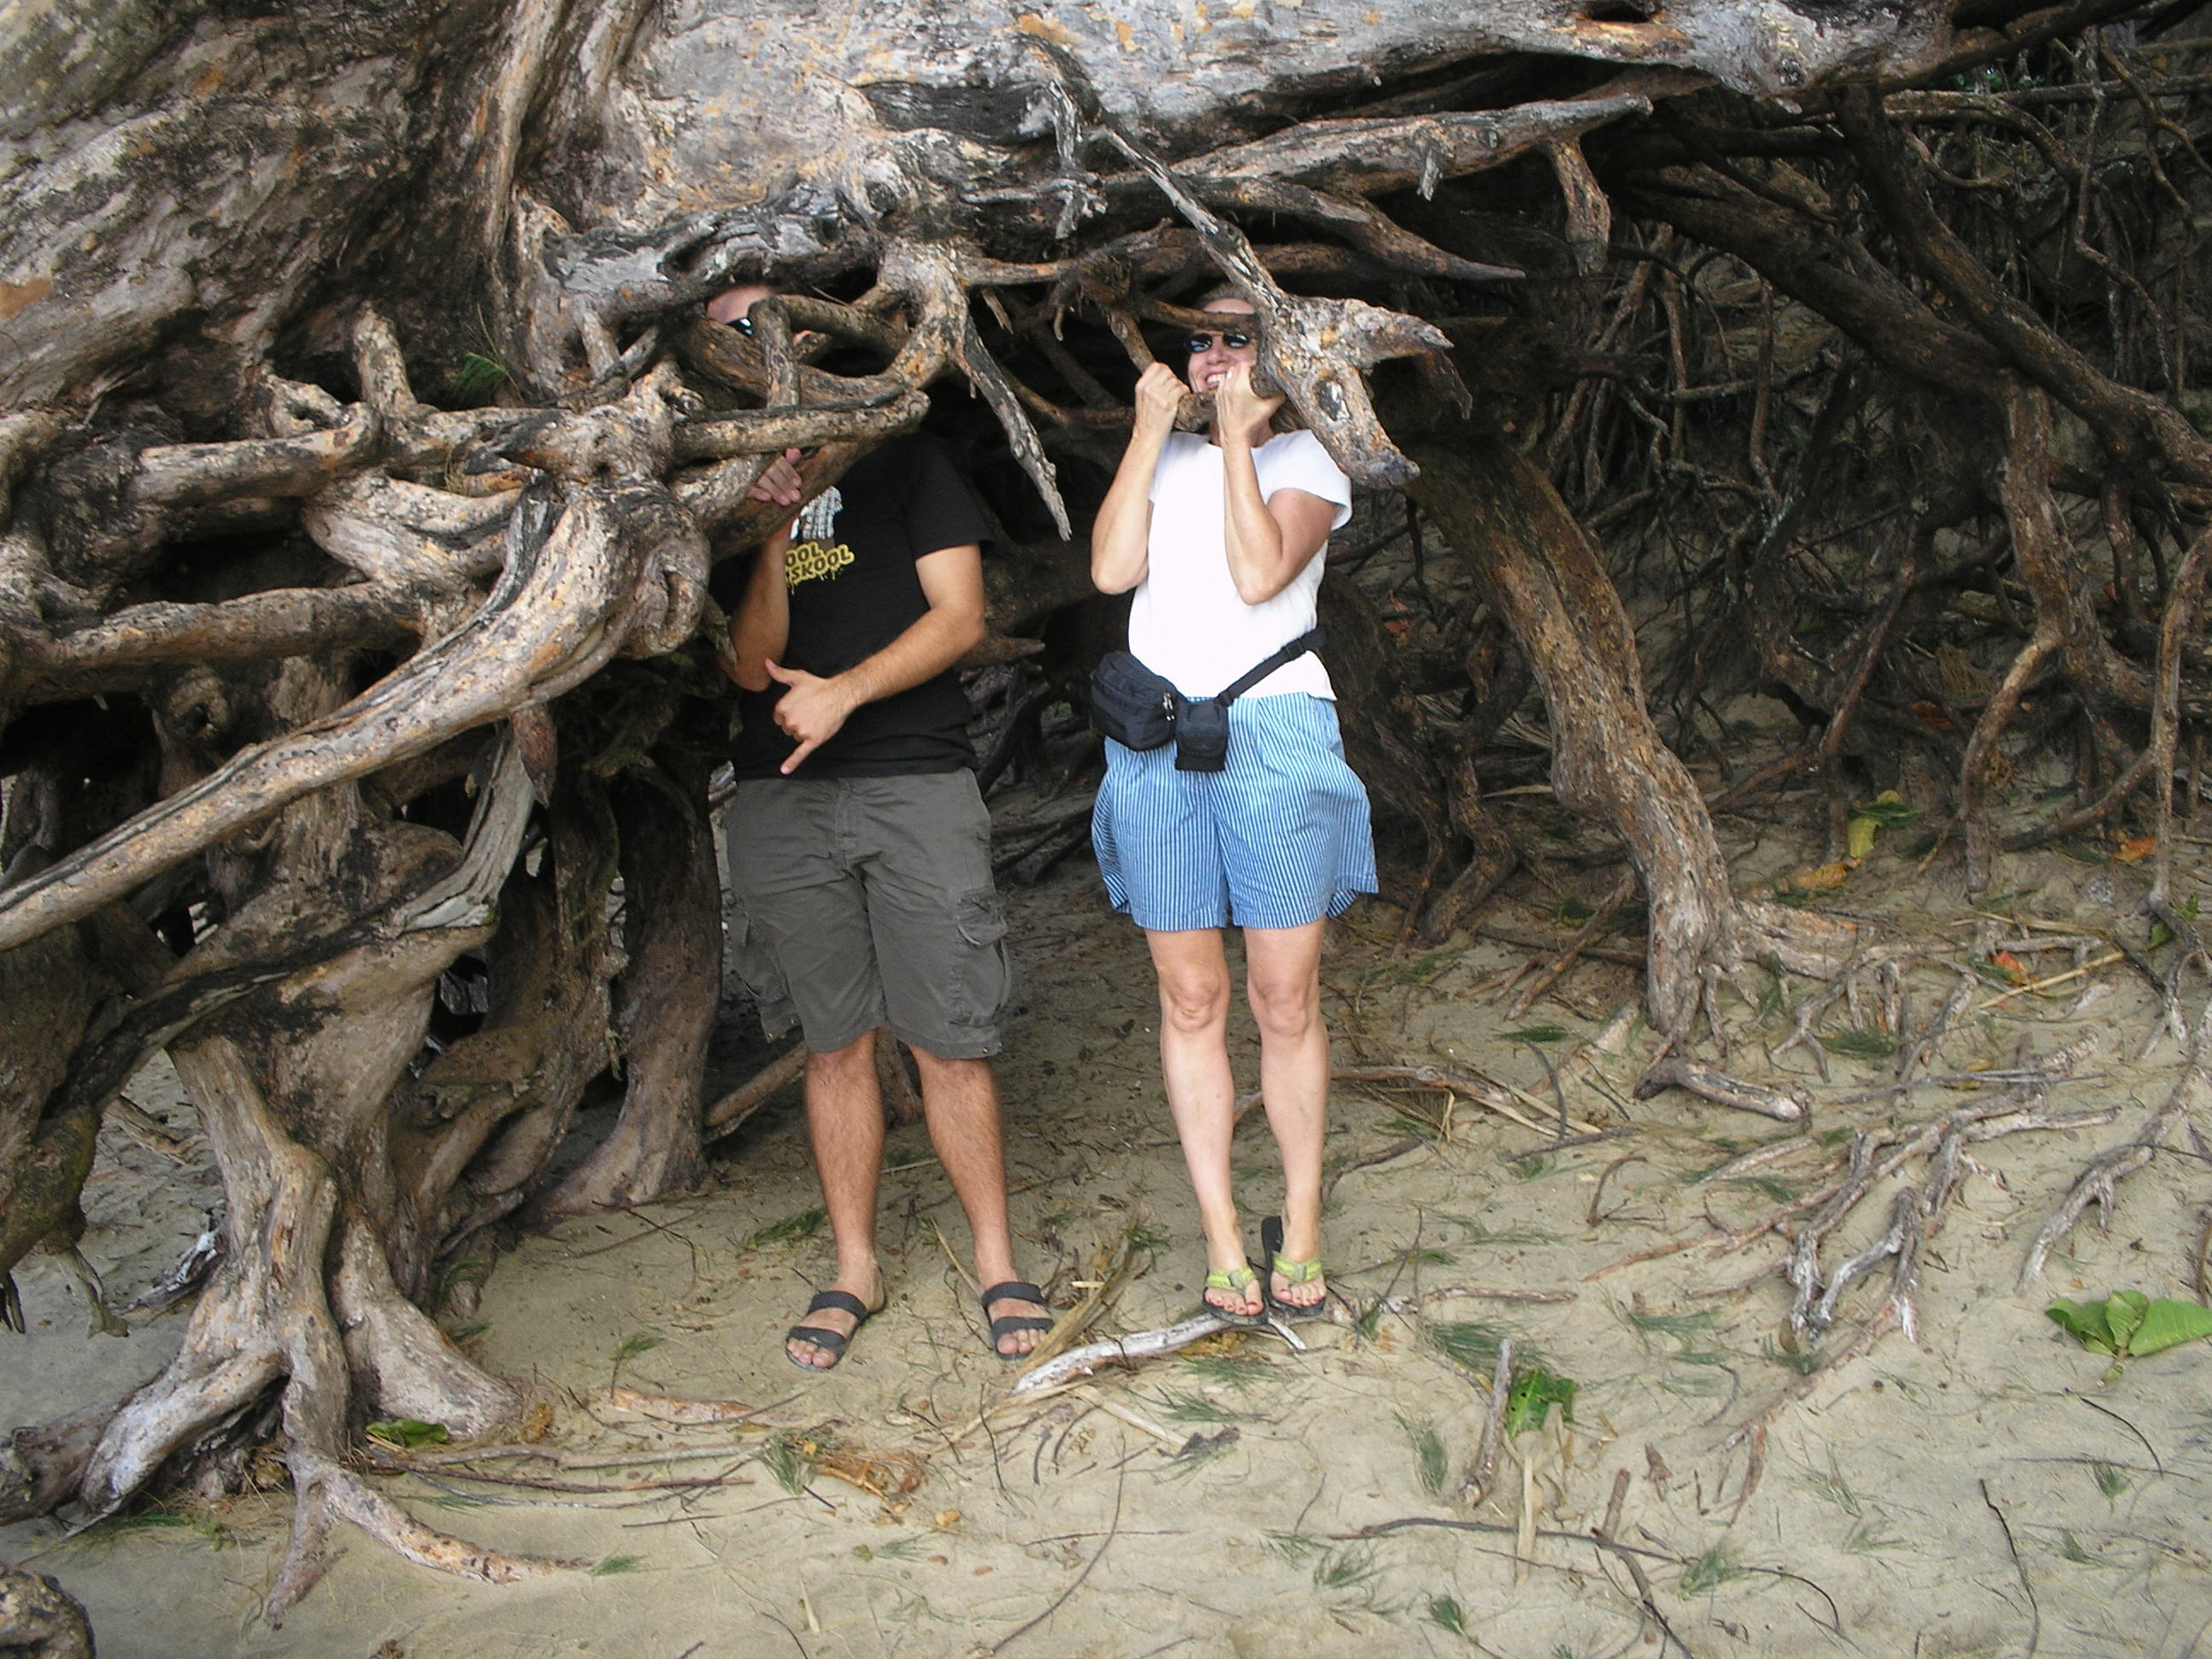 hiding in tree roots kee beach.jpg